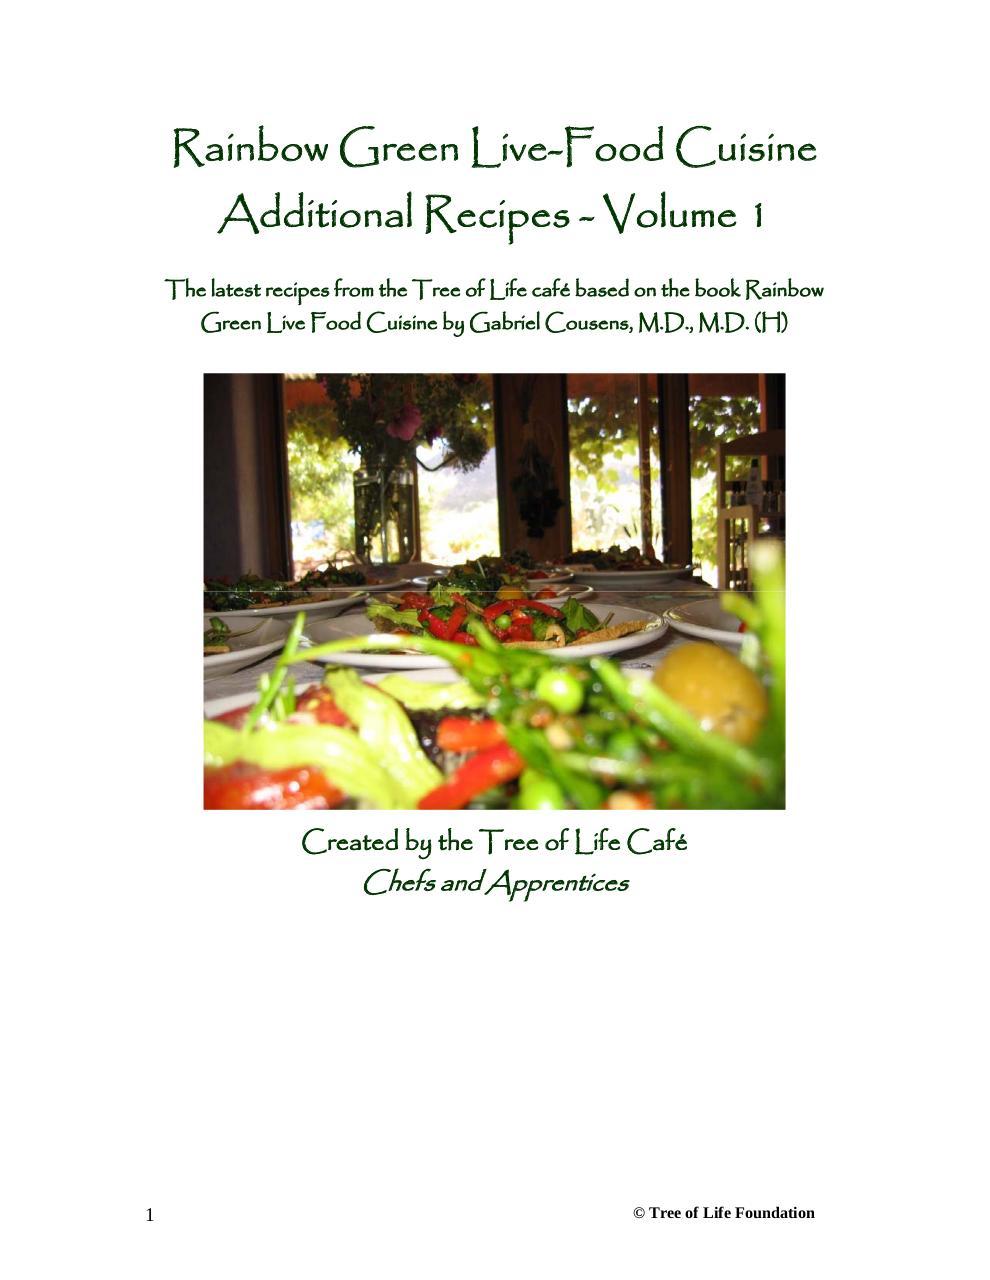 Rainbow green live food cuisine par philip madeley dr gabriel dr gabriel cousens recipespdf page 1121 forumfinder Image collections